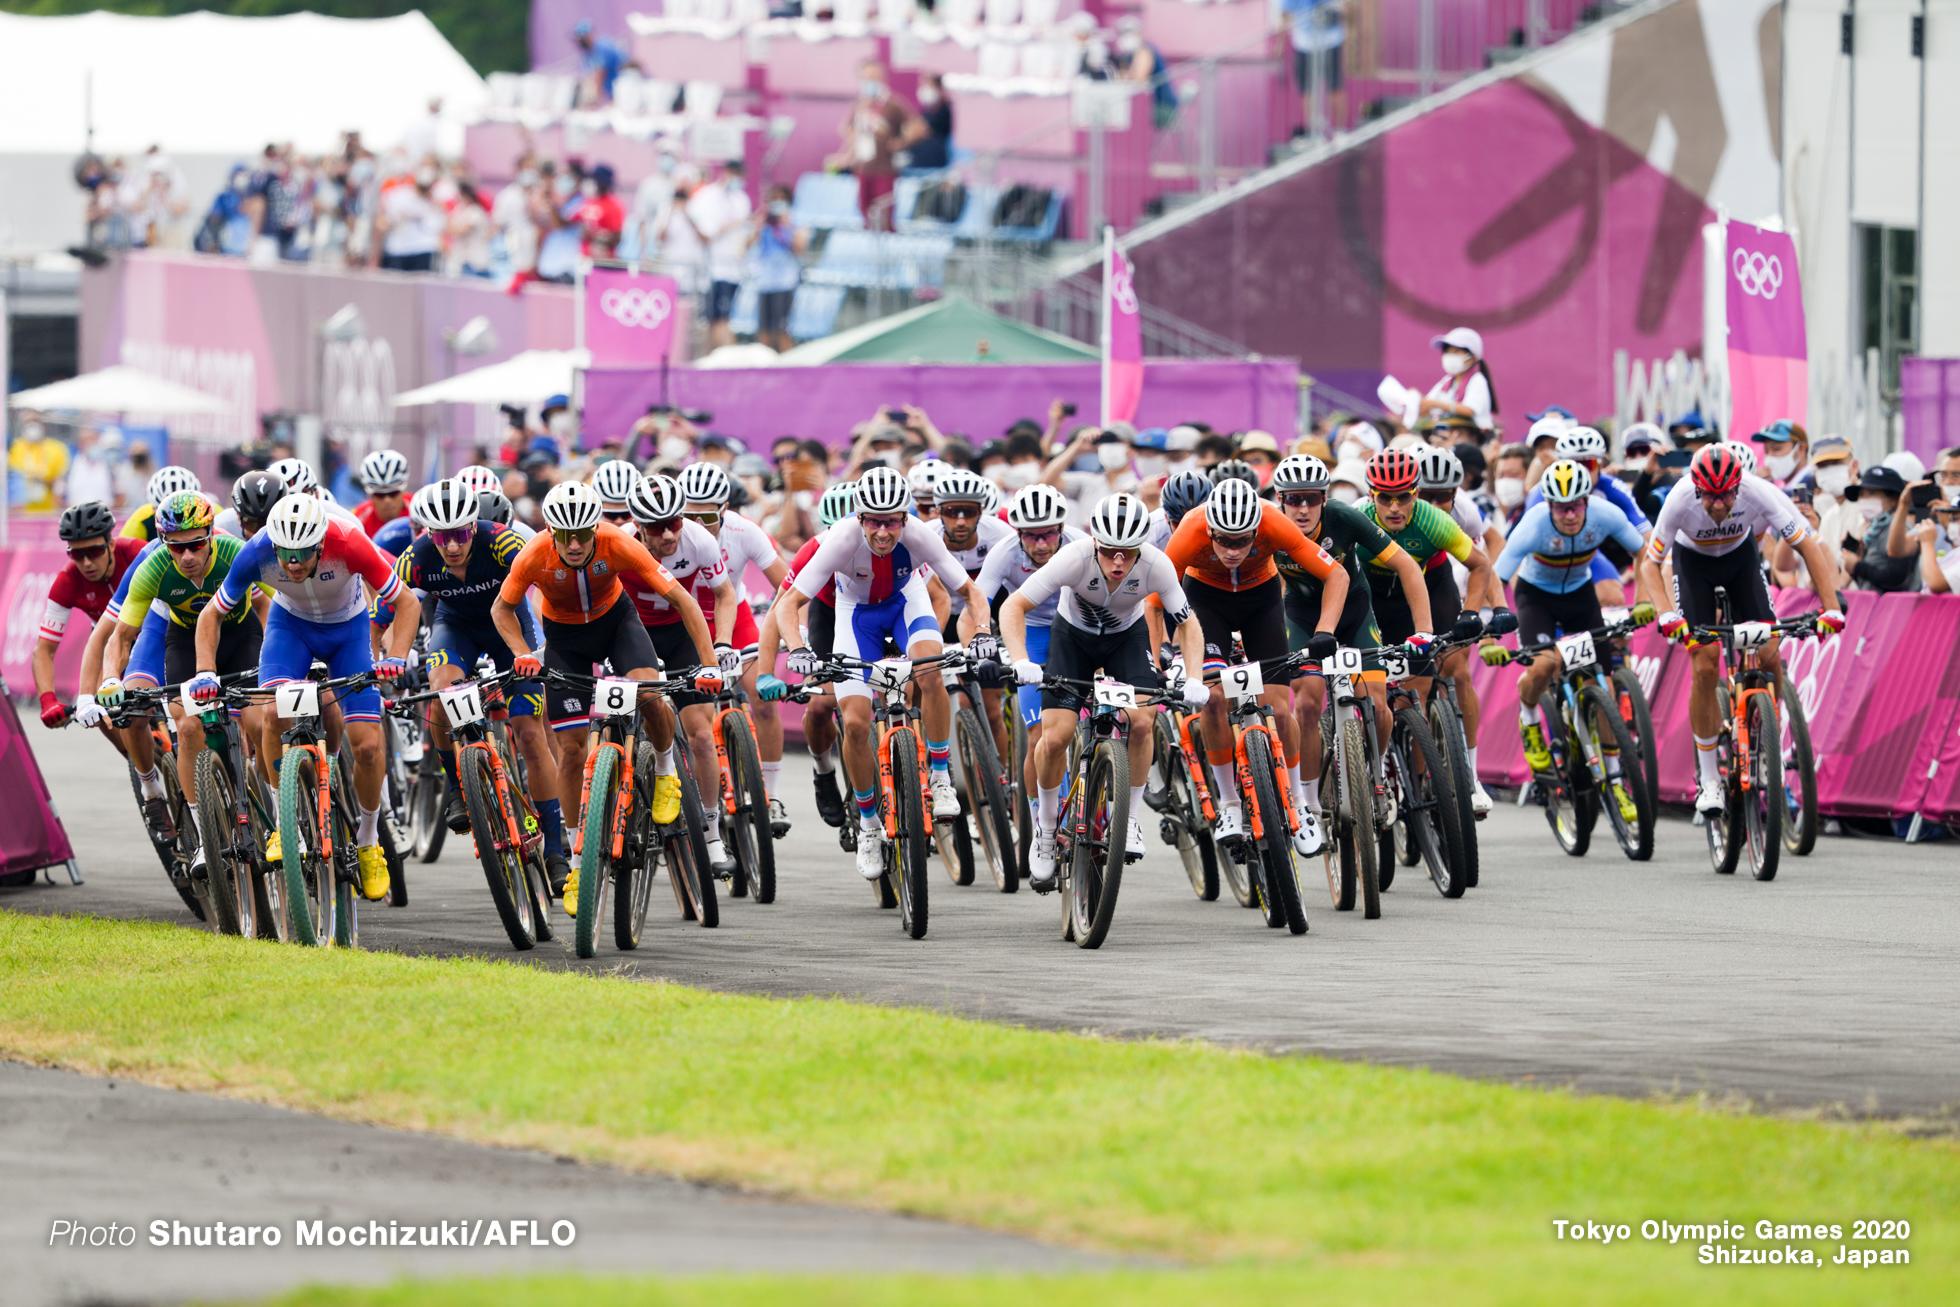 JULY 26, 2021 - Cycling : Men's Cross-country during the Tokyo 2020 Olympic Games at the Izu MTB Course in Shizuoka, Japan. (Photo by Shutaro Mochizuki/AFLO)